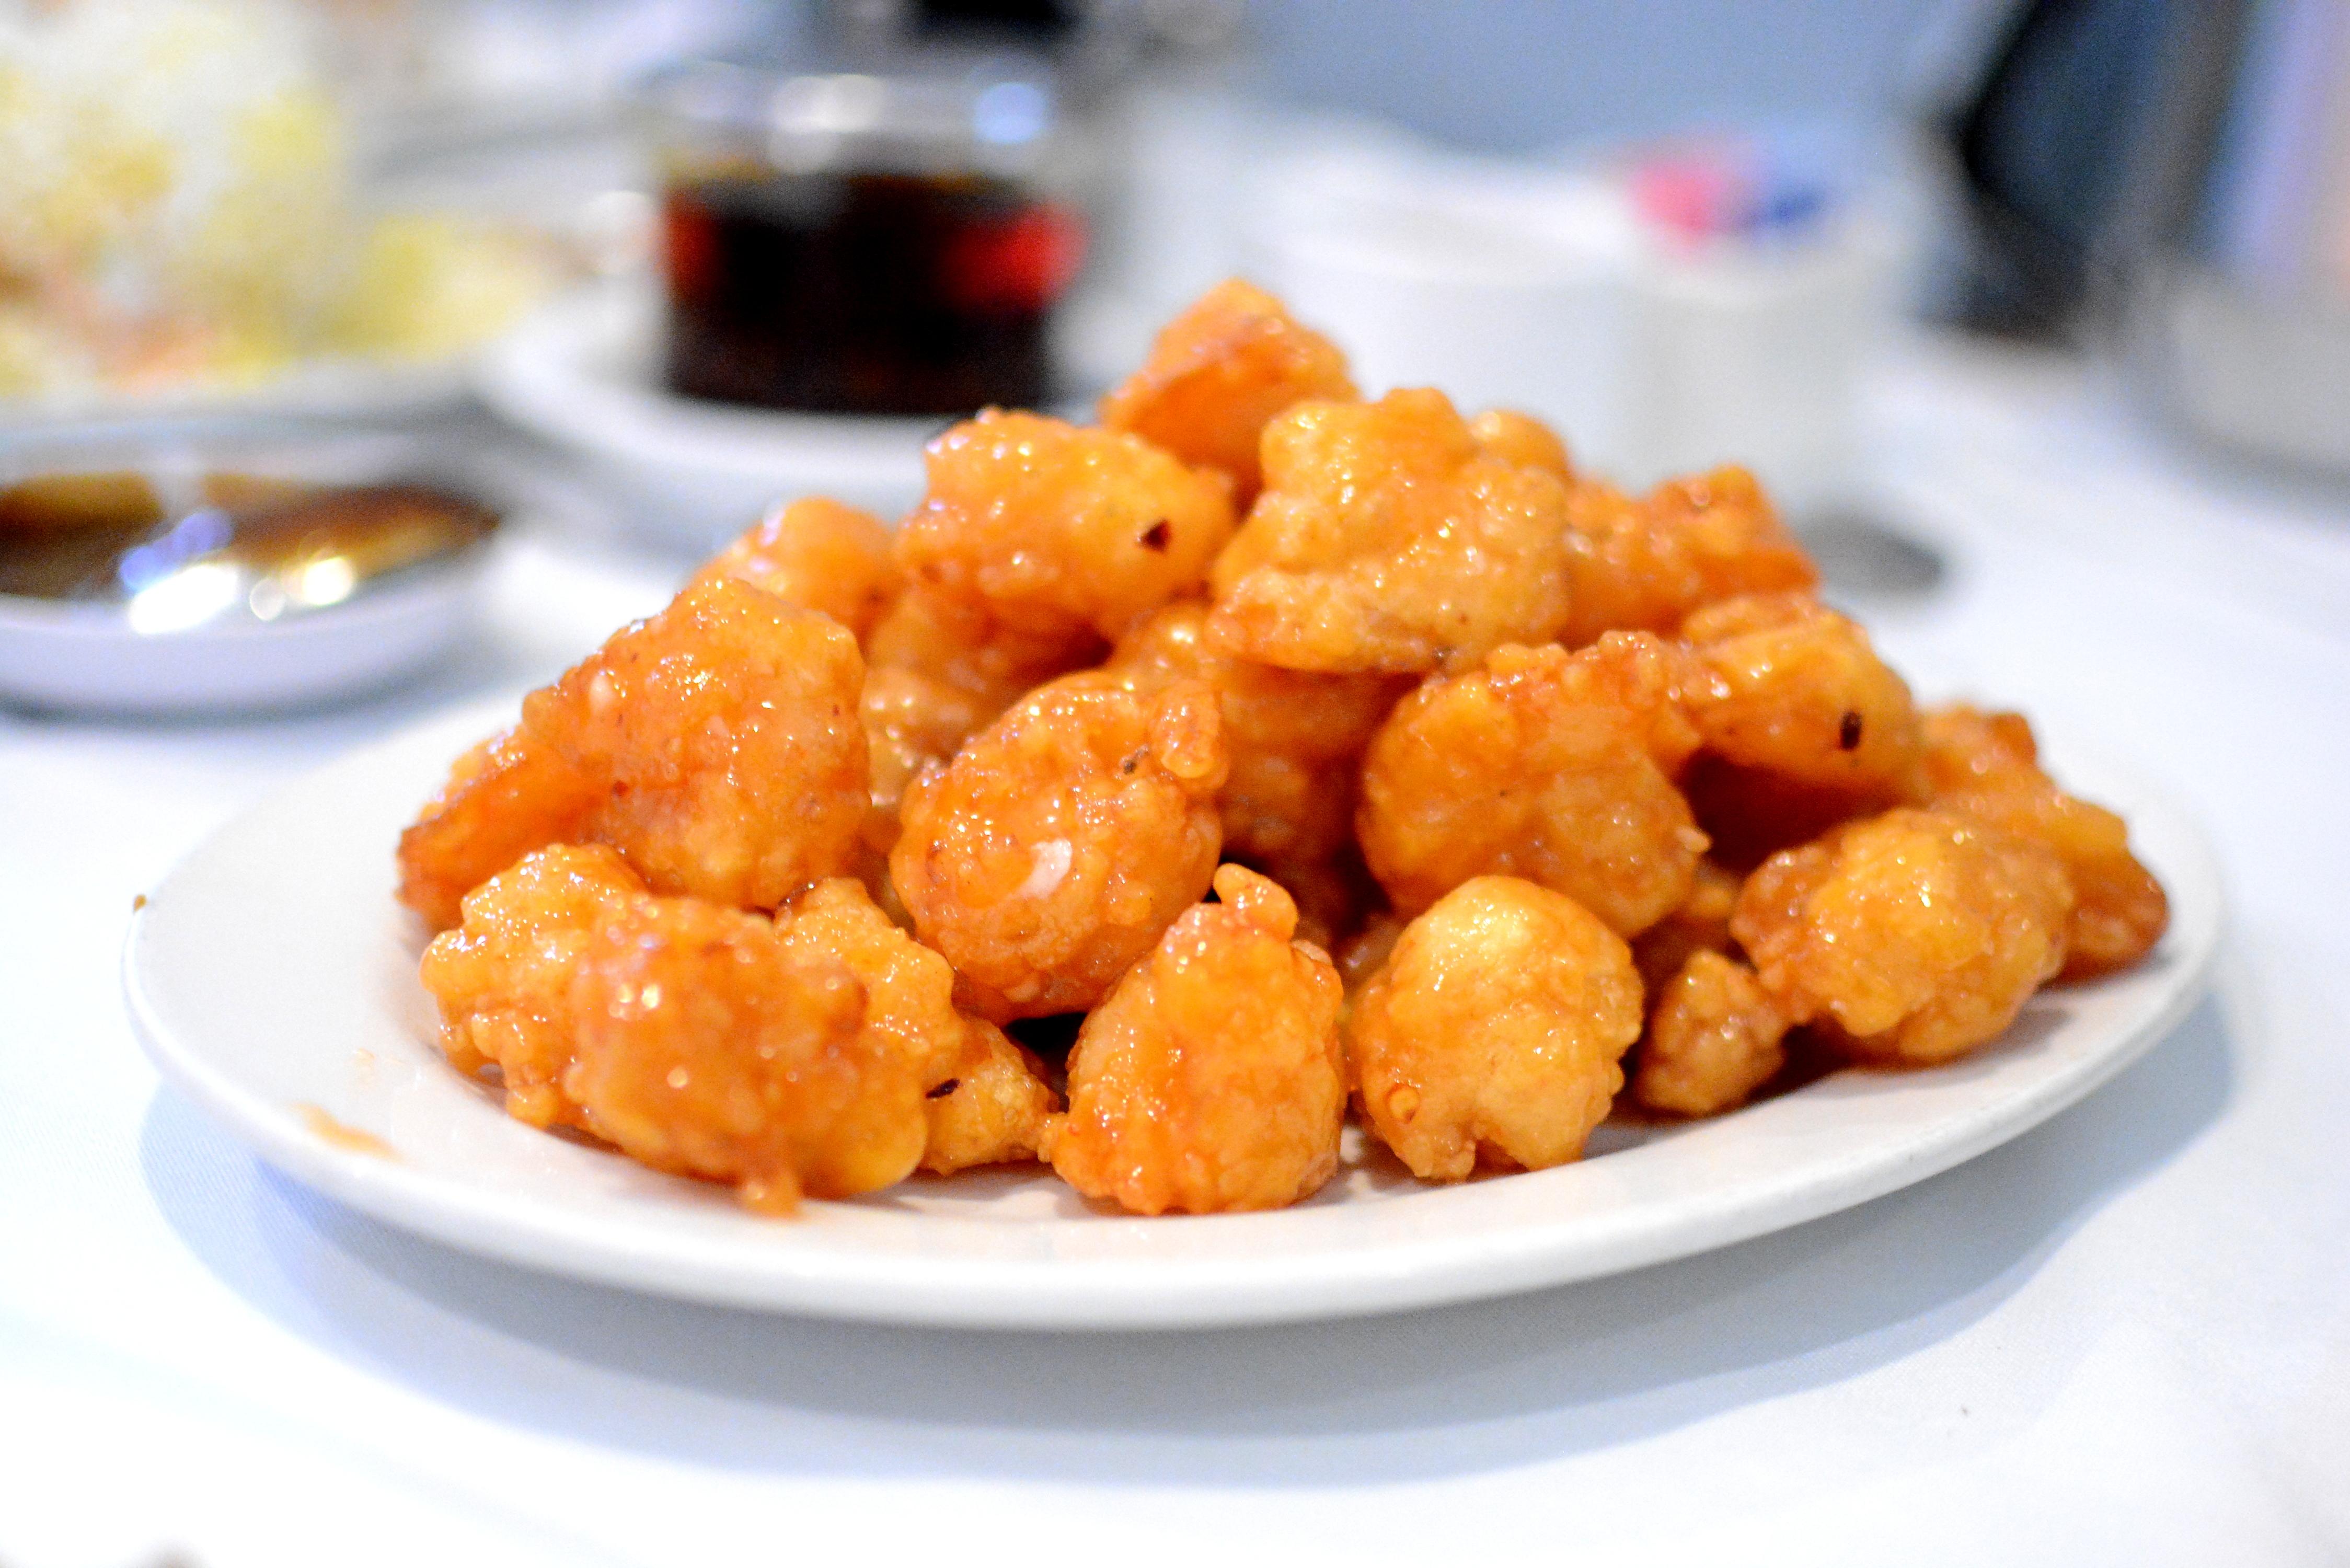 Slippery shrimp at Yang Chow